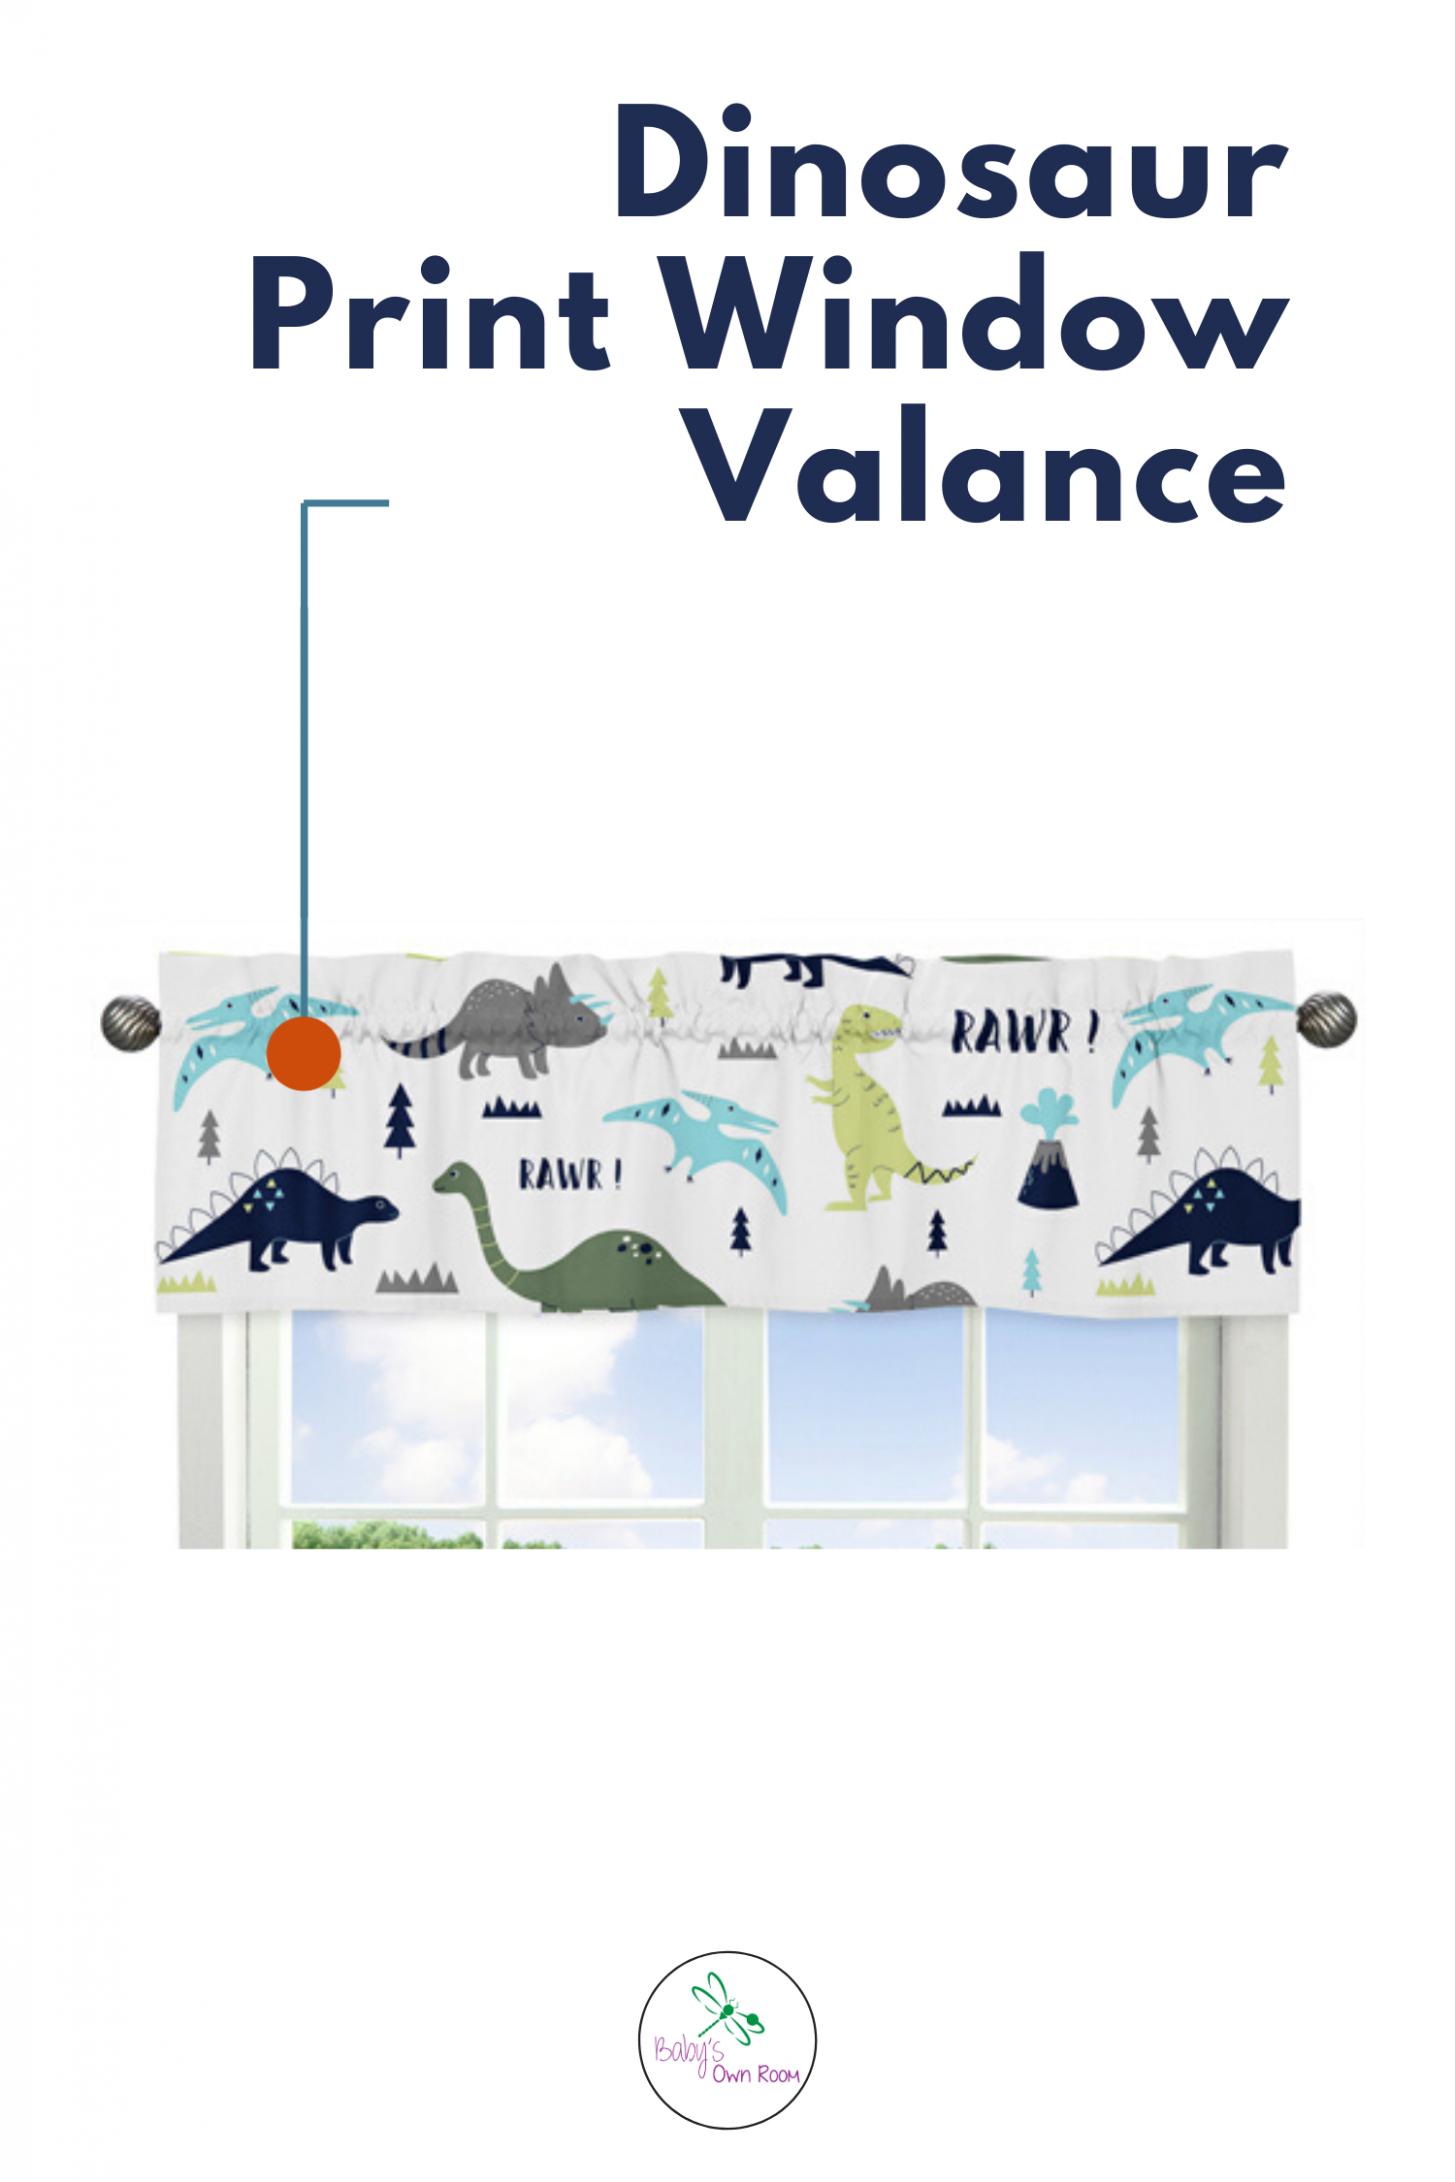 Dinosaur Blue and Green Collection Dinosaur Print Window Valance  - Baby Room Valances